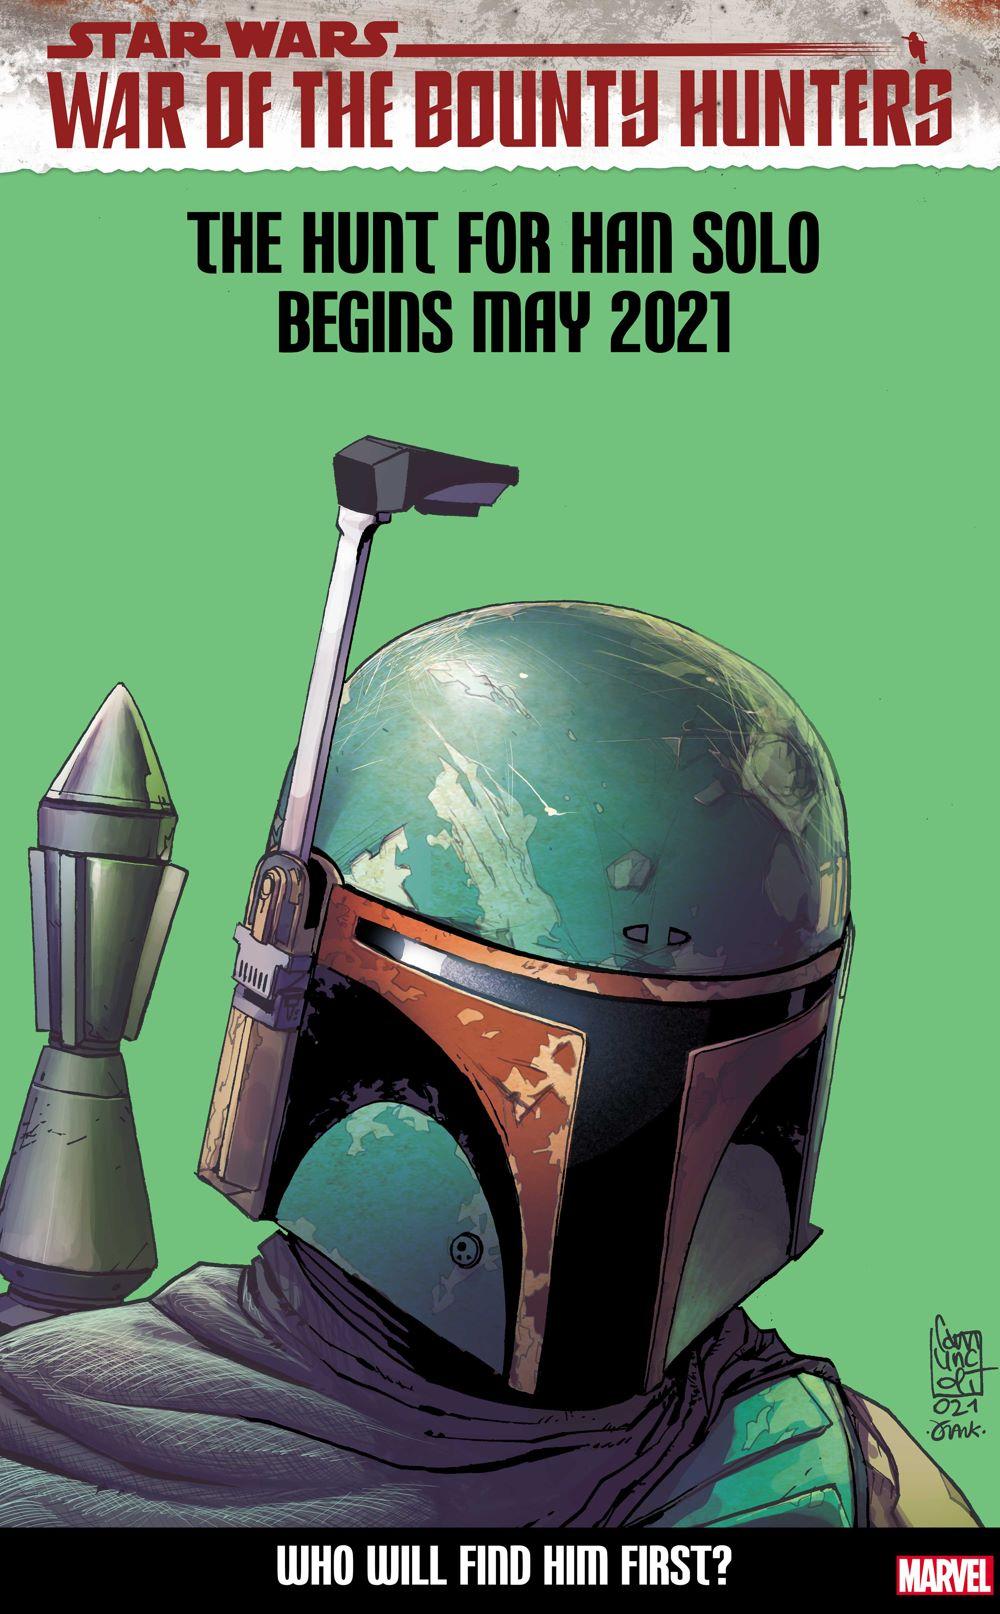 STWWAROTBH2021002_headshot Star Wars hunts for Han Solo in WAR OF THE BOUNTY HUNTERS